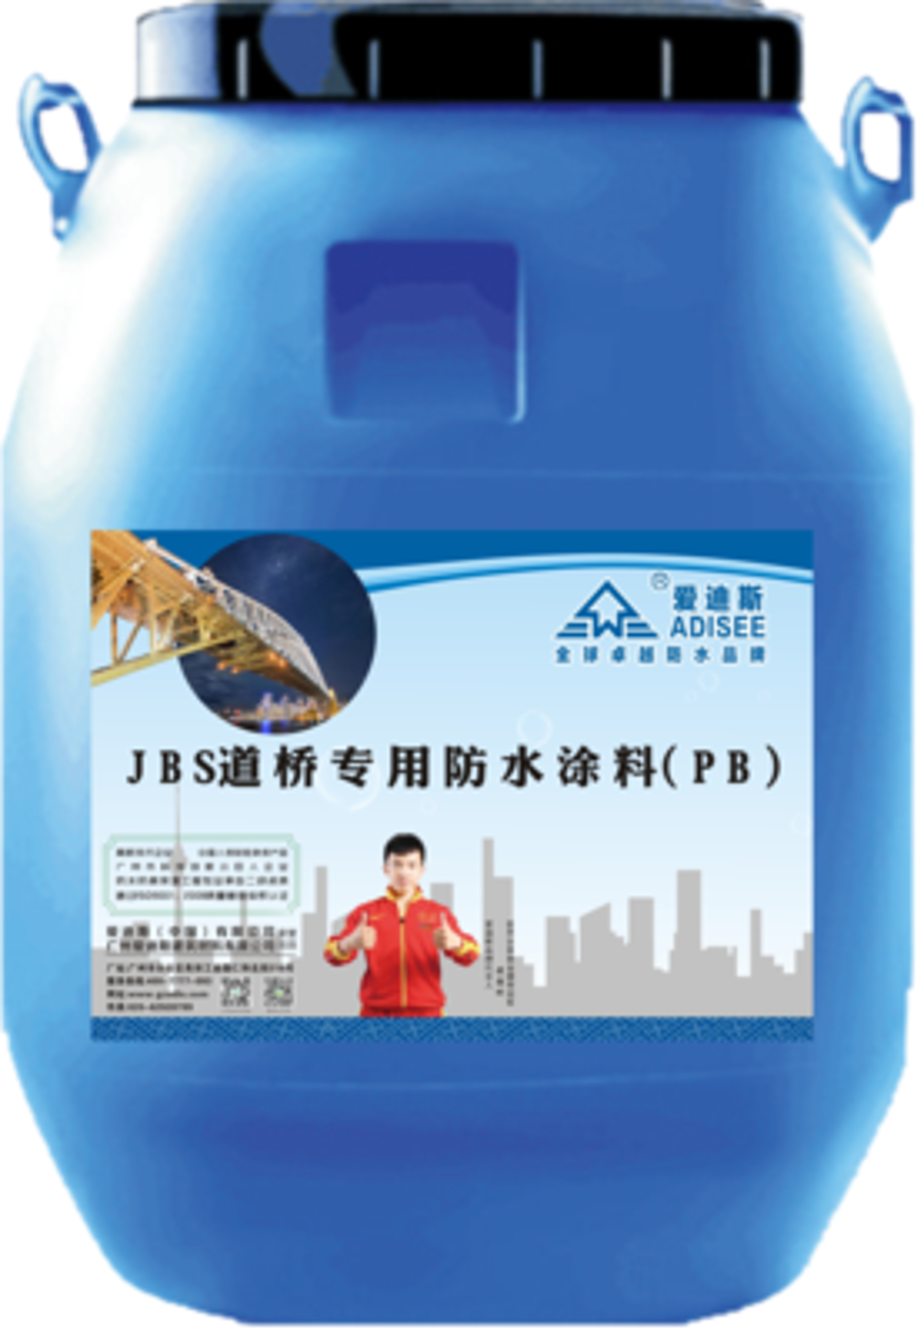 HC-208 JBS道桥专用防水涂料(PB)